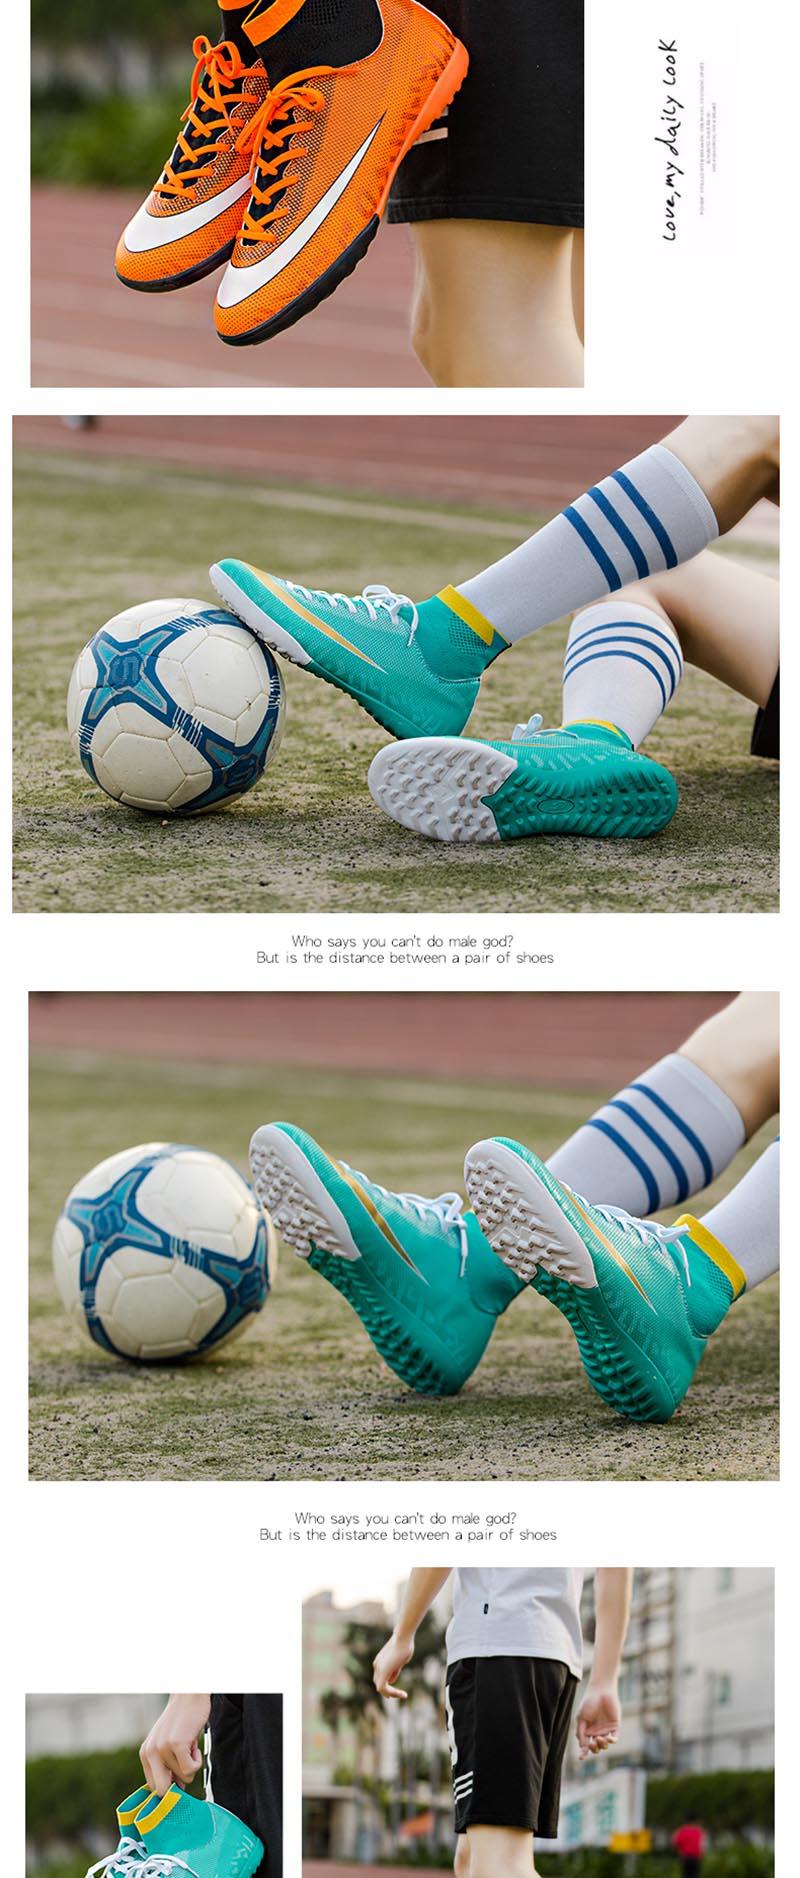 chuteiras sapatos meninos crianças treinamento futsal tênis